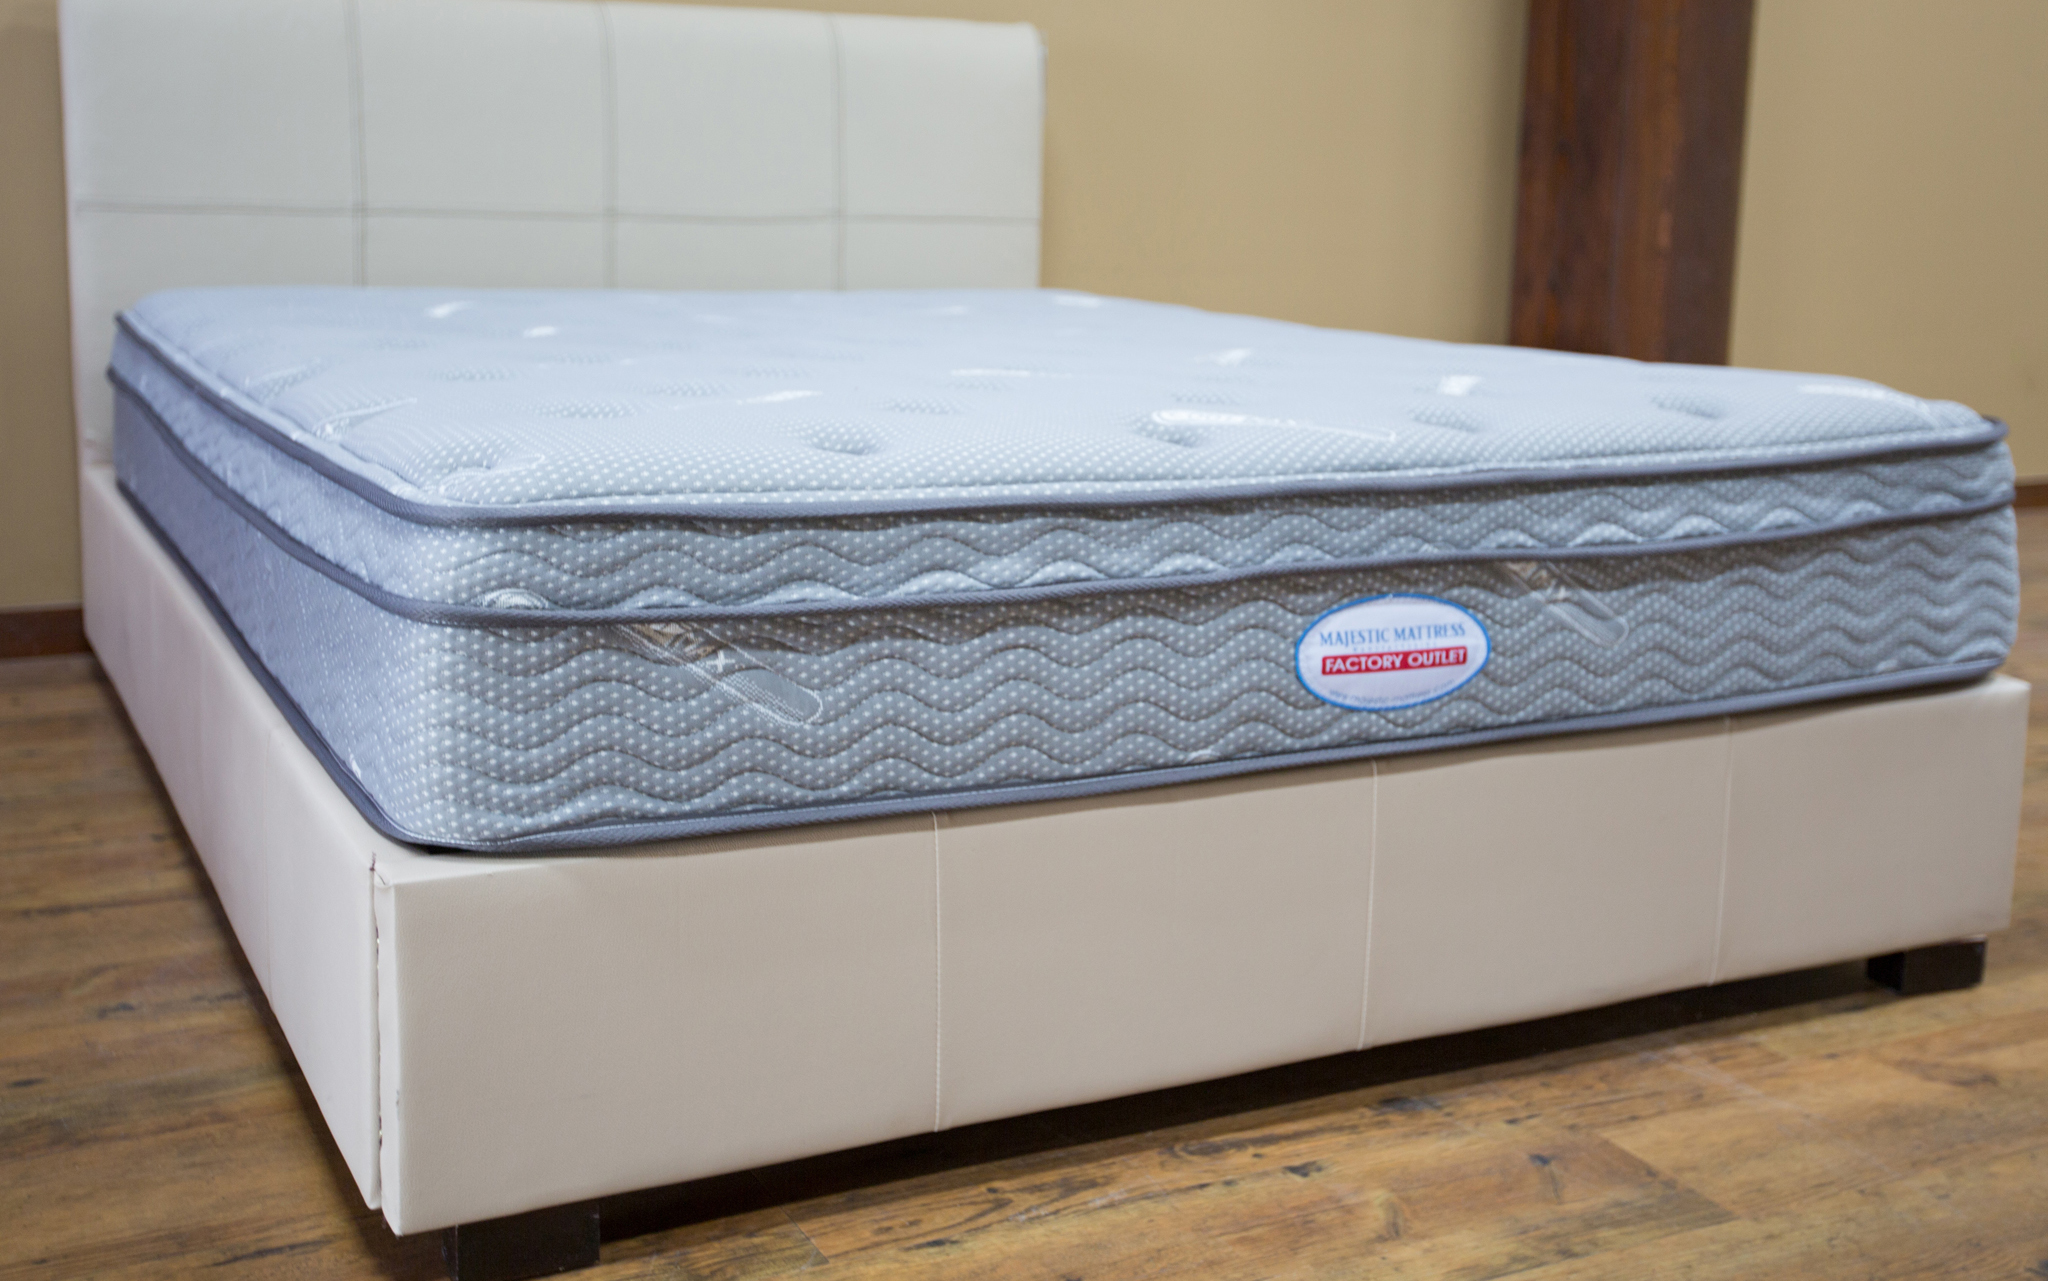 Majestic Mattress - Your Mattress Store & Bedroom Furniture Outlet | Majestic Mattress Kelowna Aurora Euro Top